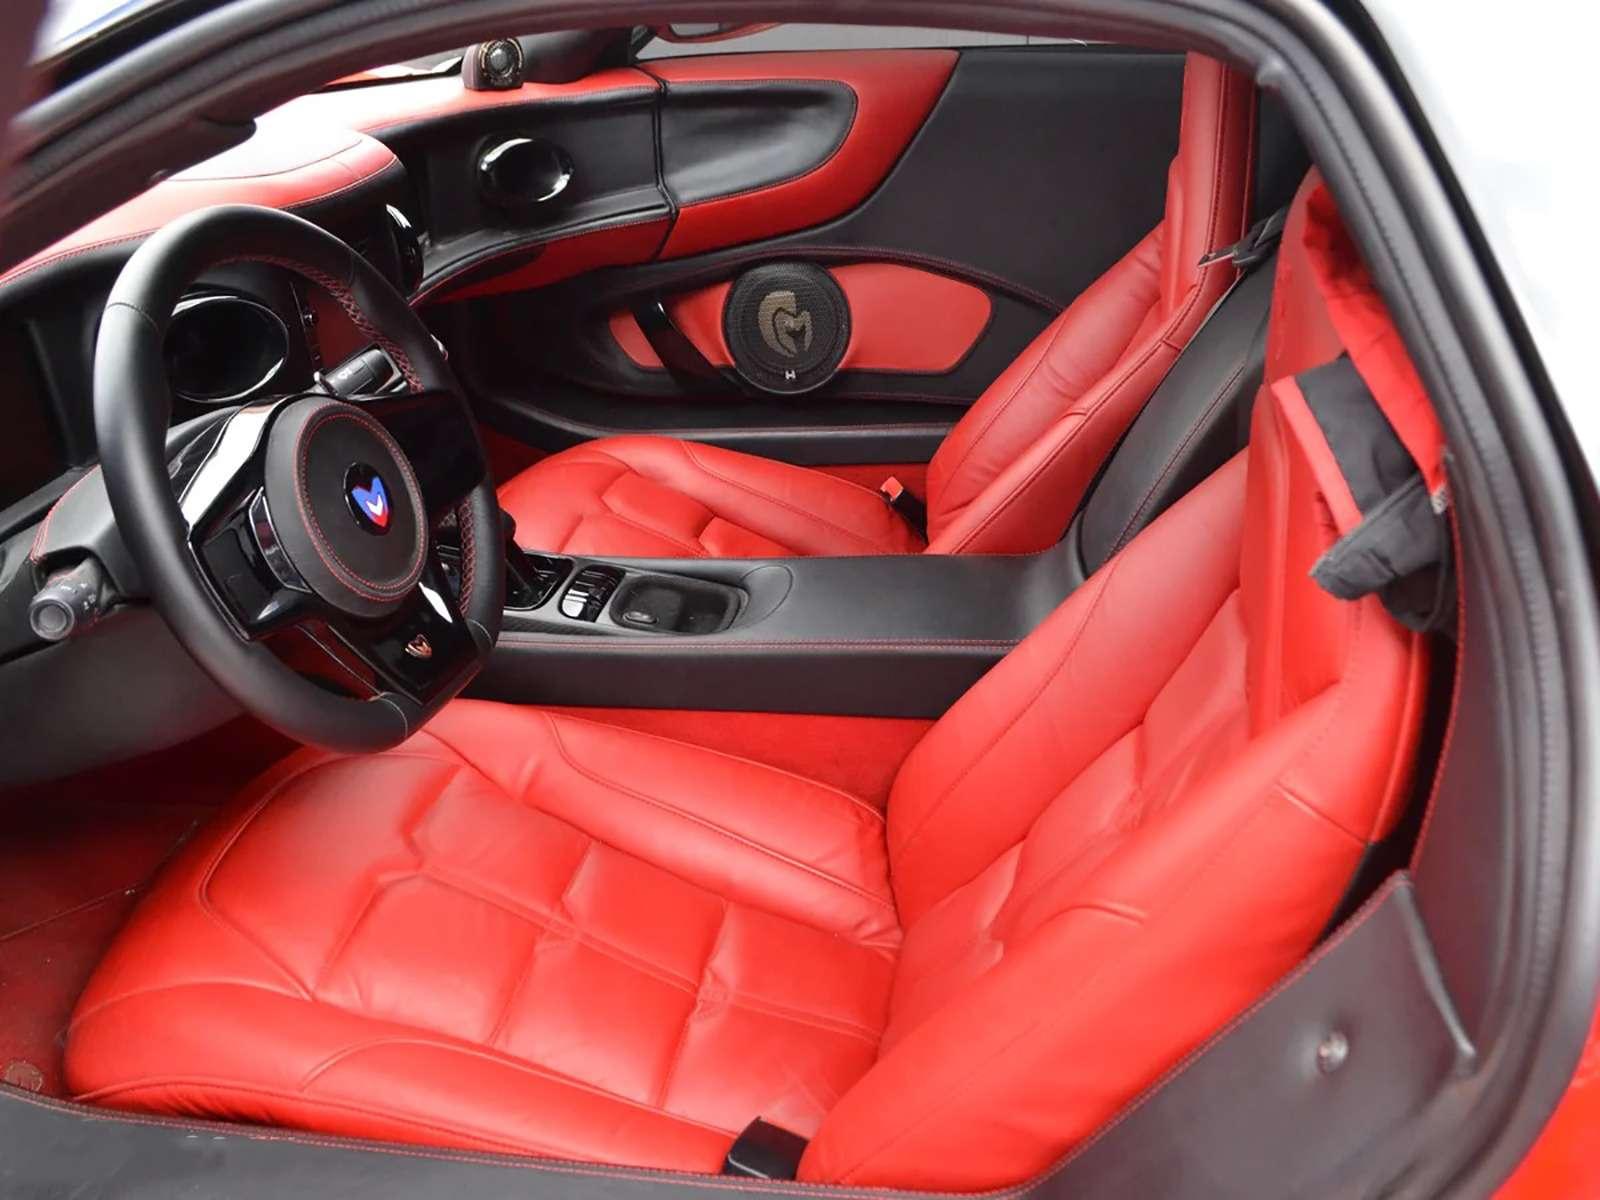 В Сети продают спорткар Marussia за10миллионов рублей— фото 893920